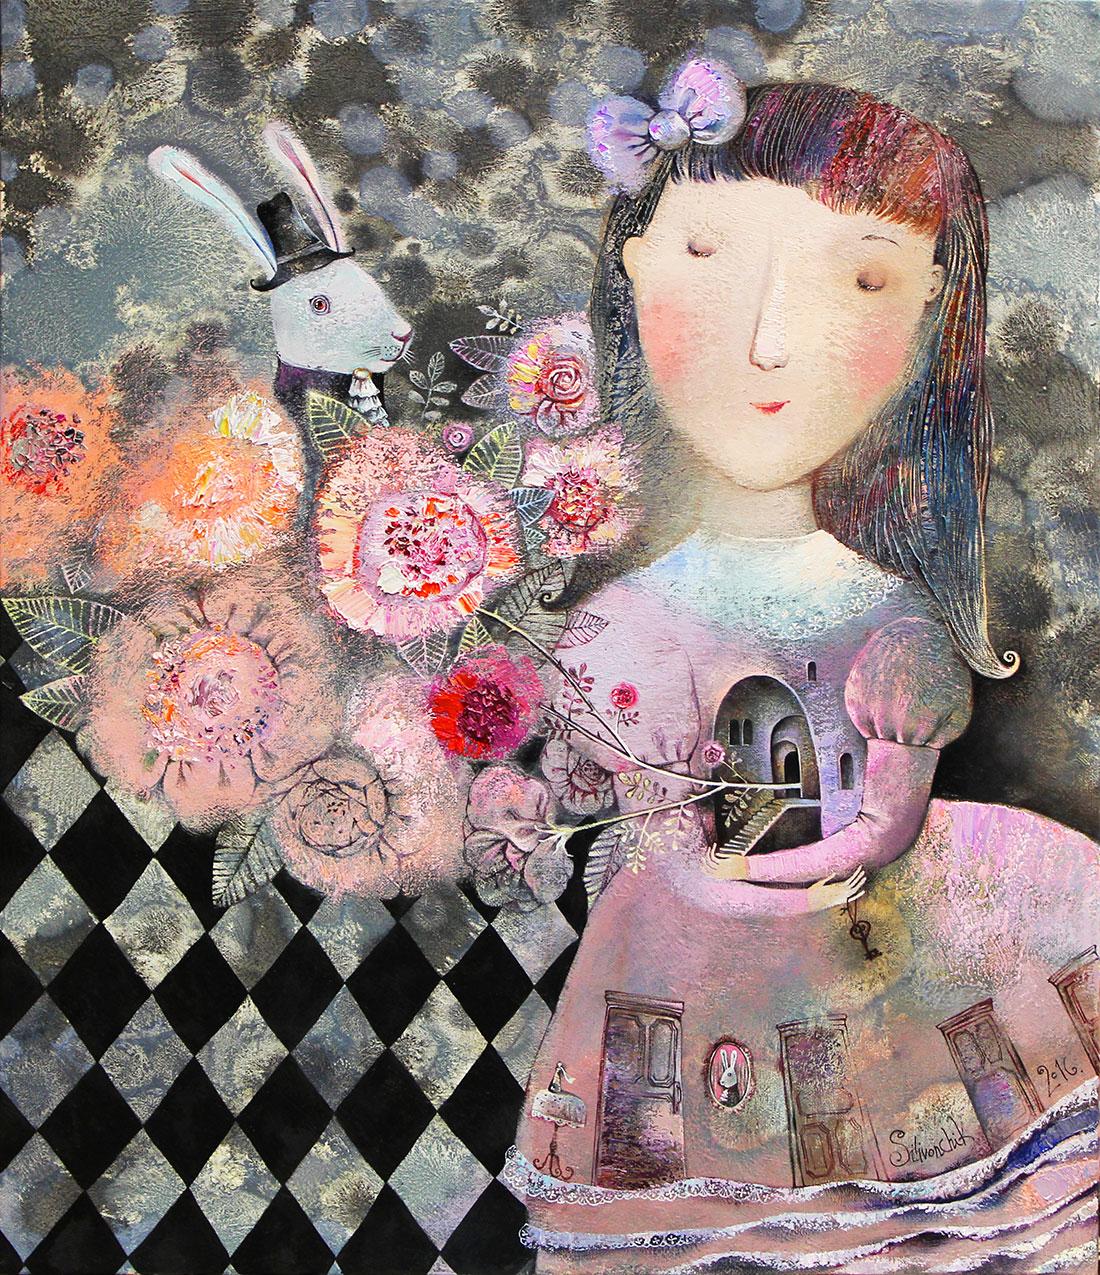 Wonderful Garden (Alice in Wonderland), 2016, Oil on Canvas, 28 x 24 in (70 x 60 cm)